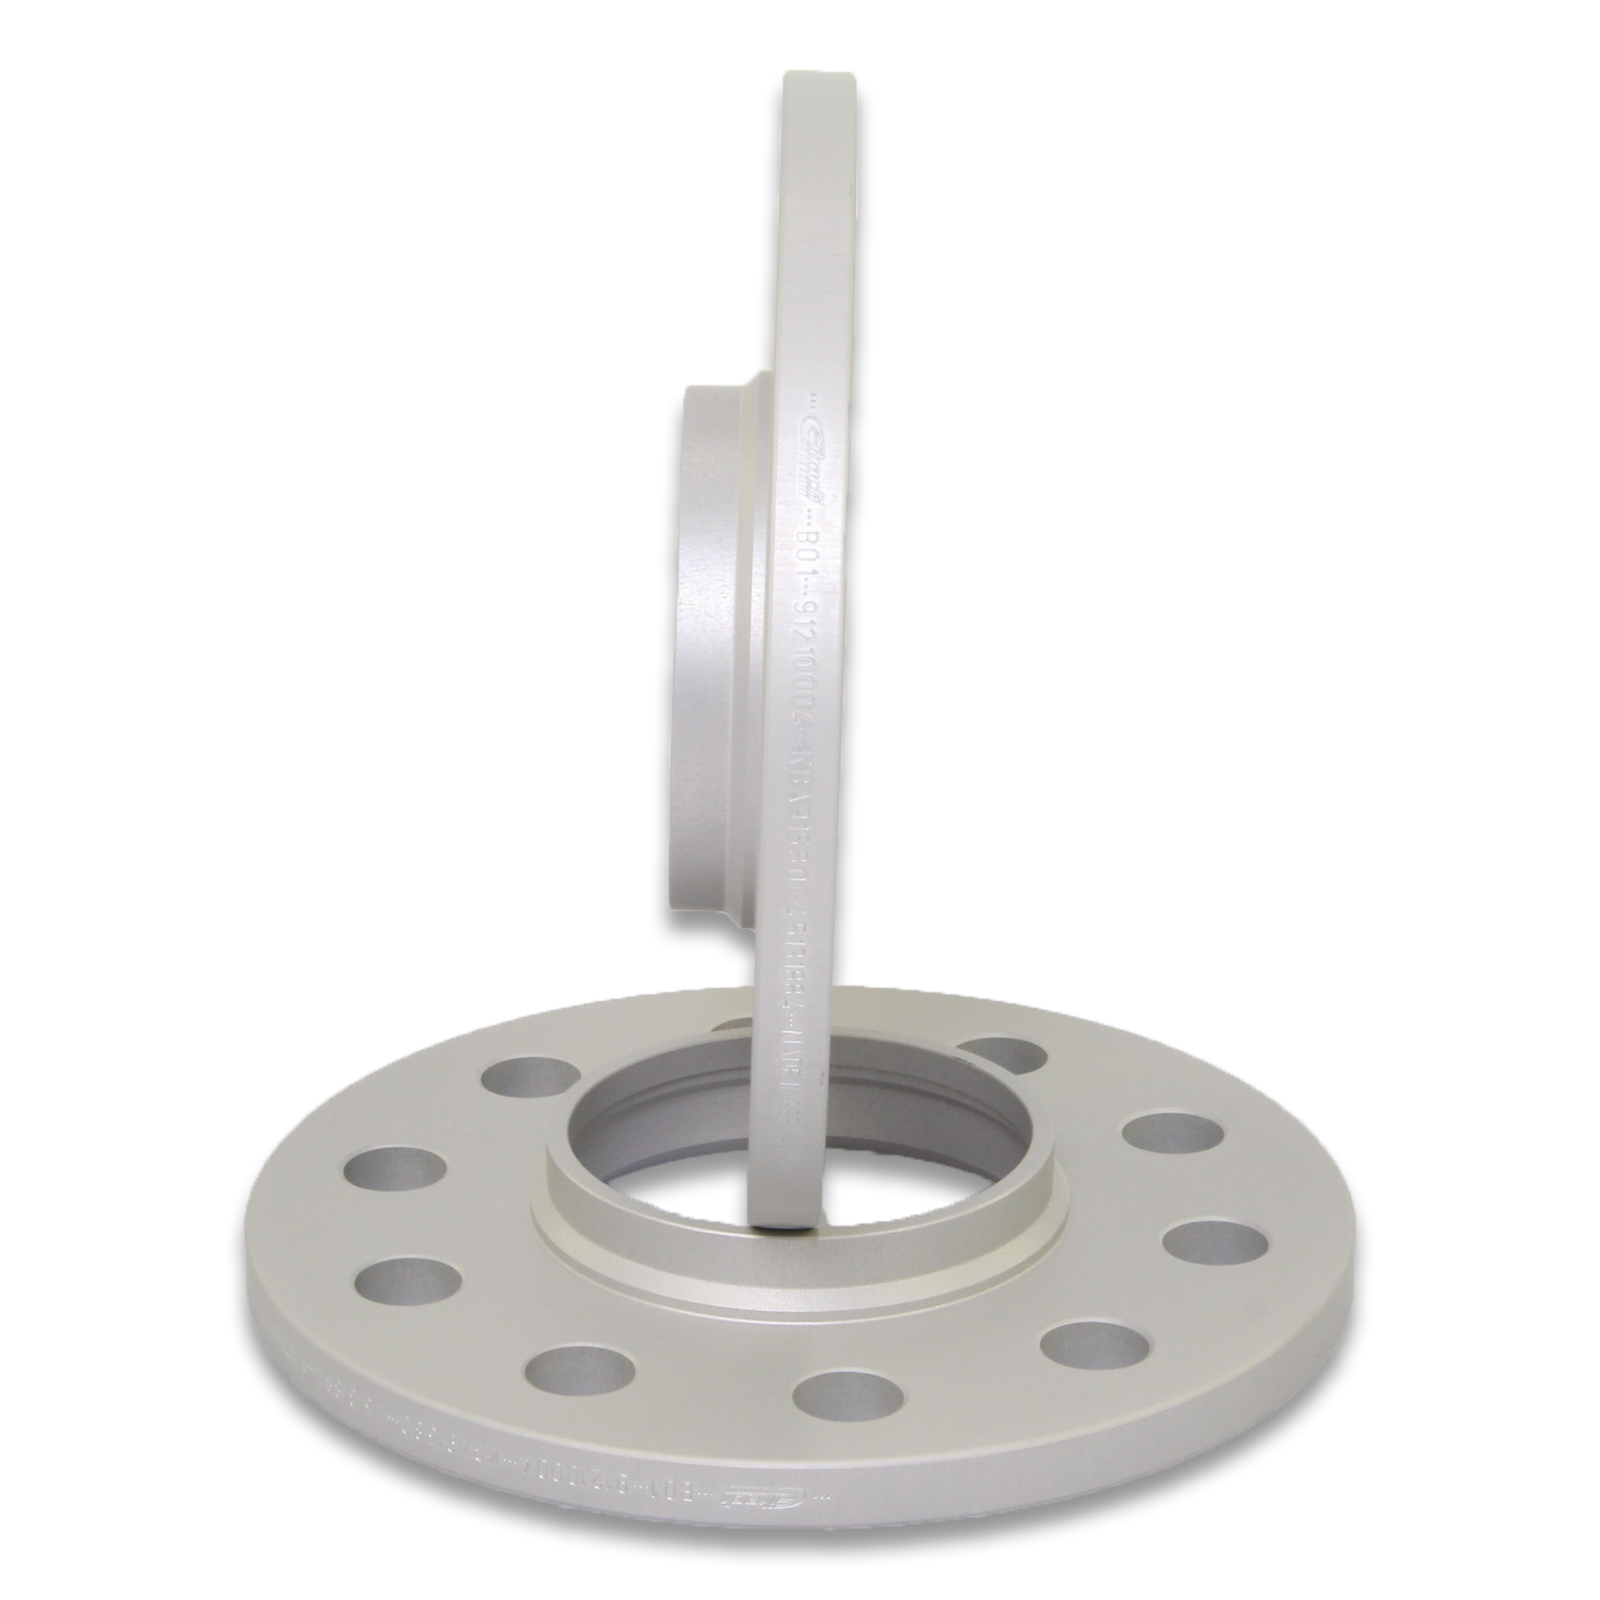 EIBACH Spurplatten Spurverbreiterung Distanzscheibe Ø72,5 5x120 20mm // 2x10mm